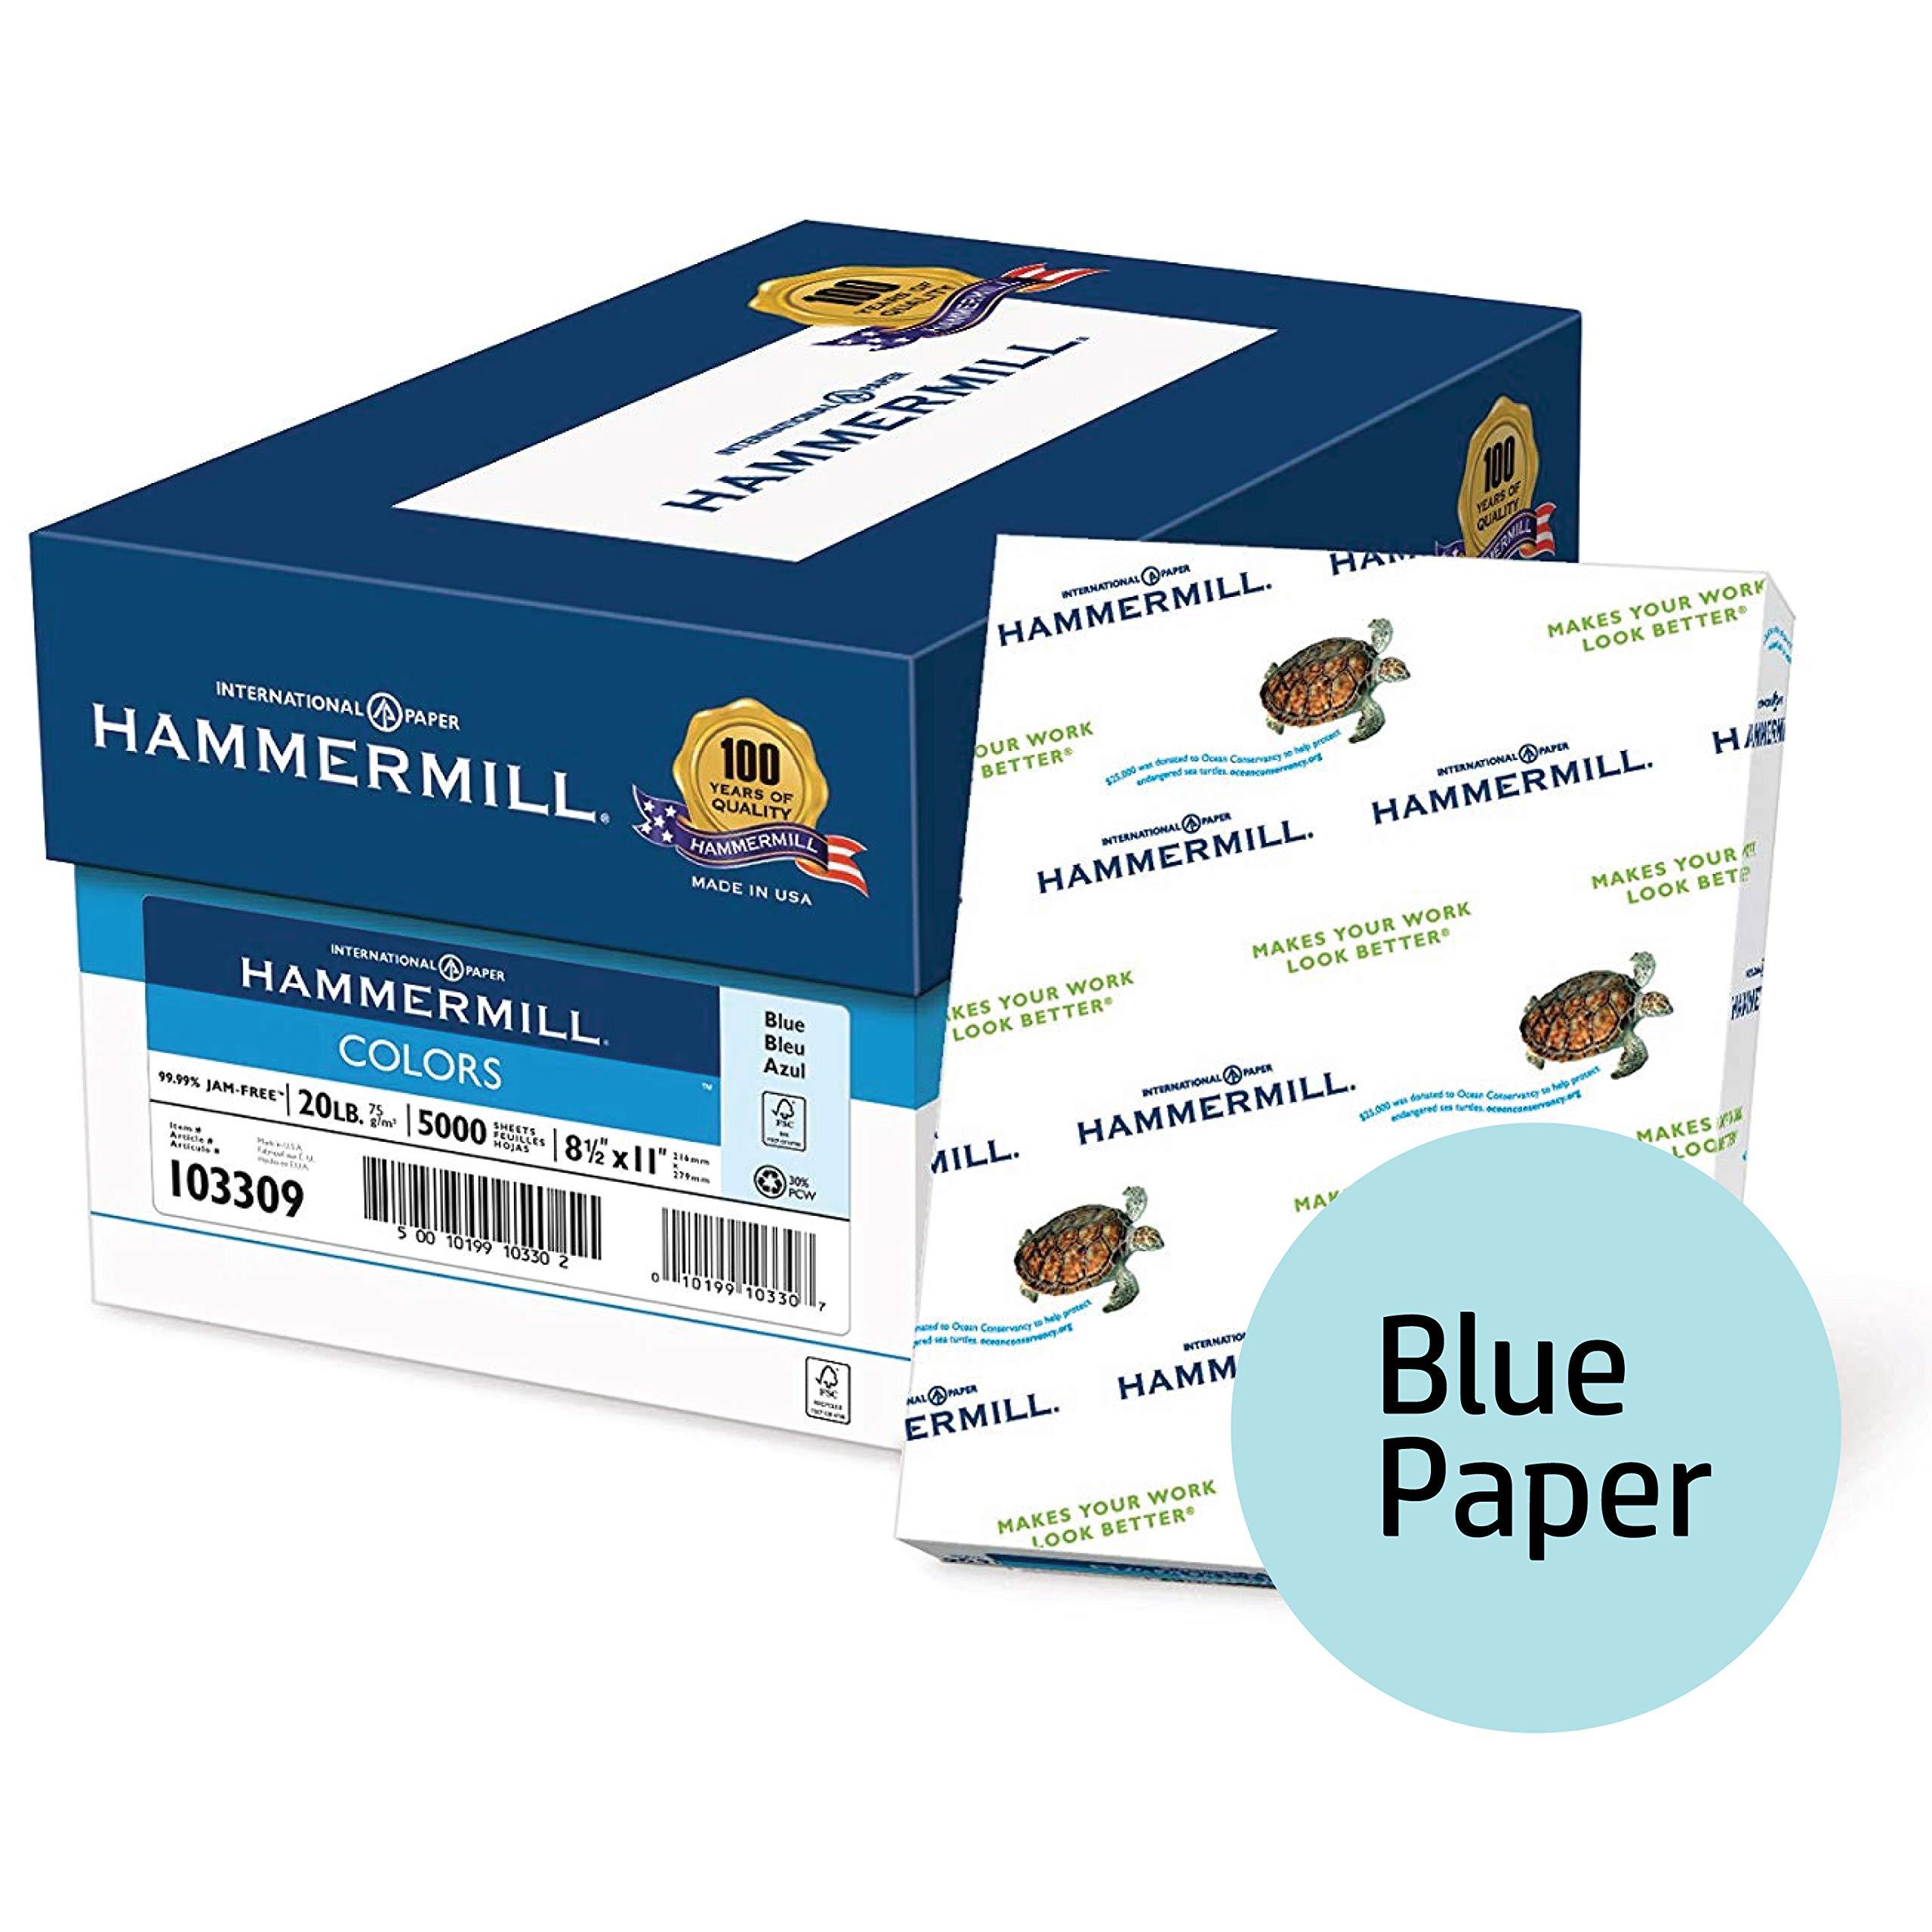 Hammermill Colored Paper, Blue Printer Paper, 20lb, 8.5x11 Paper, Letter Size, 5000 Sheets / 10 Ream Case, Pastel Paper, Colorful Paper (103309C) by Hammermill